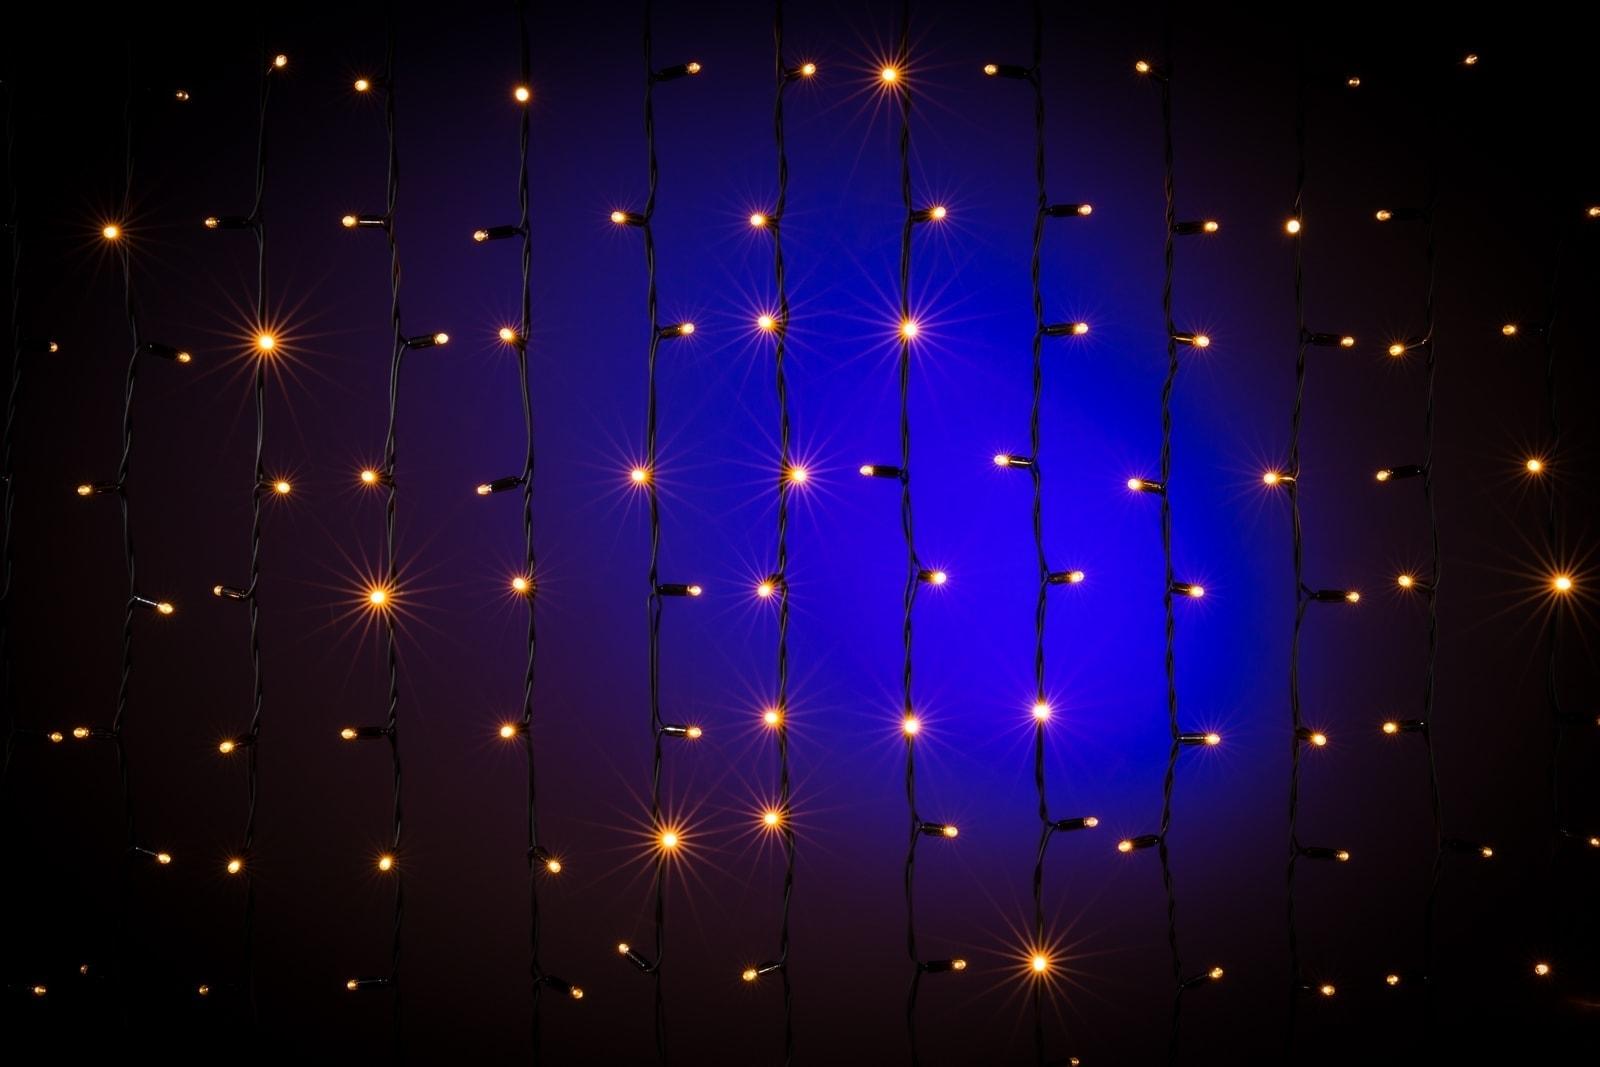 Led Gordijn Kopen : Lichtgordijn led u m m u lampjes u warm wit starterset